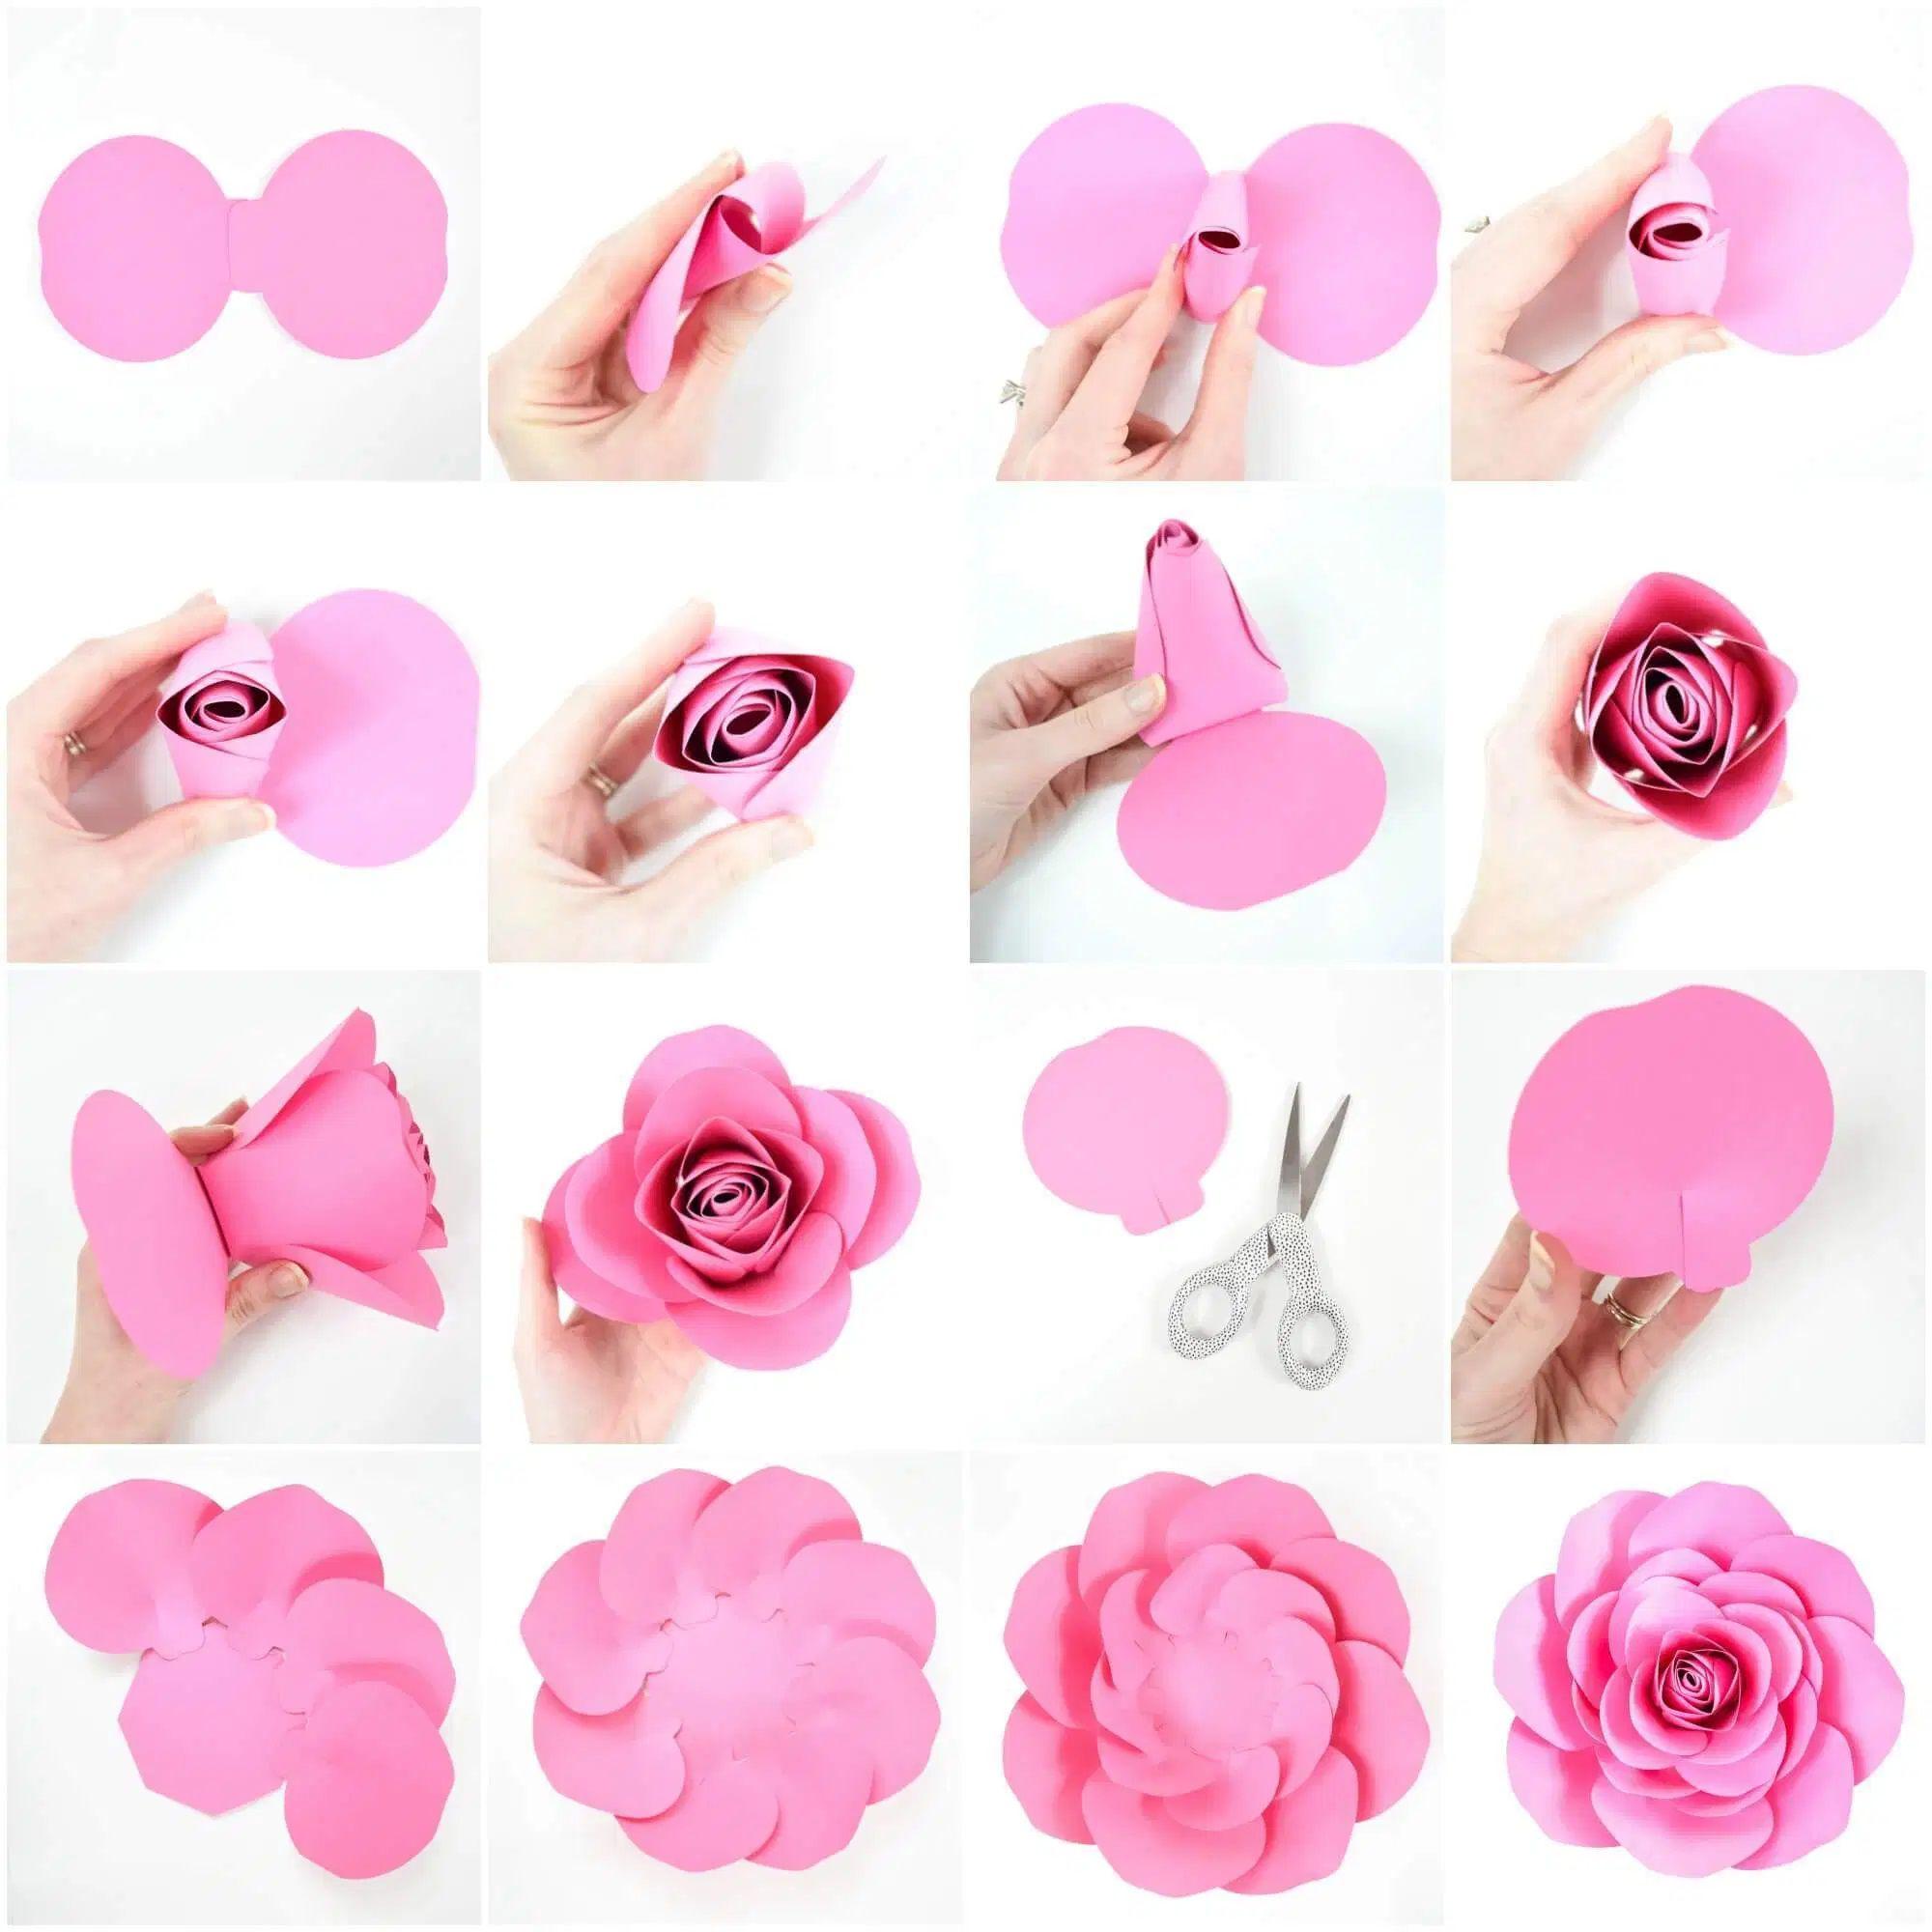 008 Dreaded Paper Rose Template Pdf Concept  Flower Giant Free CrepeFull